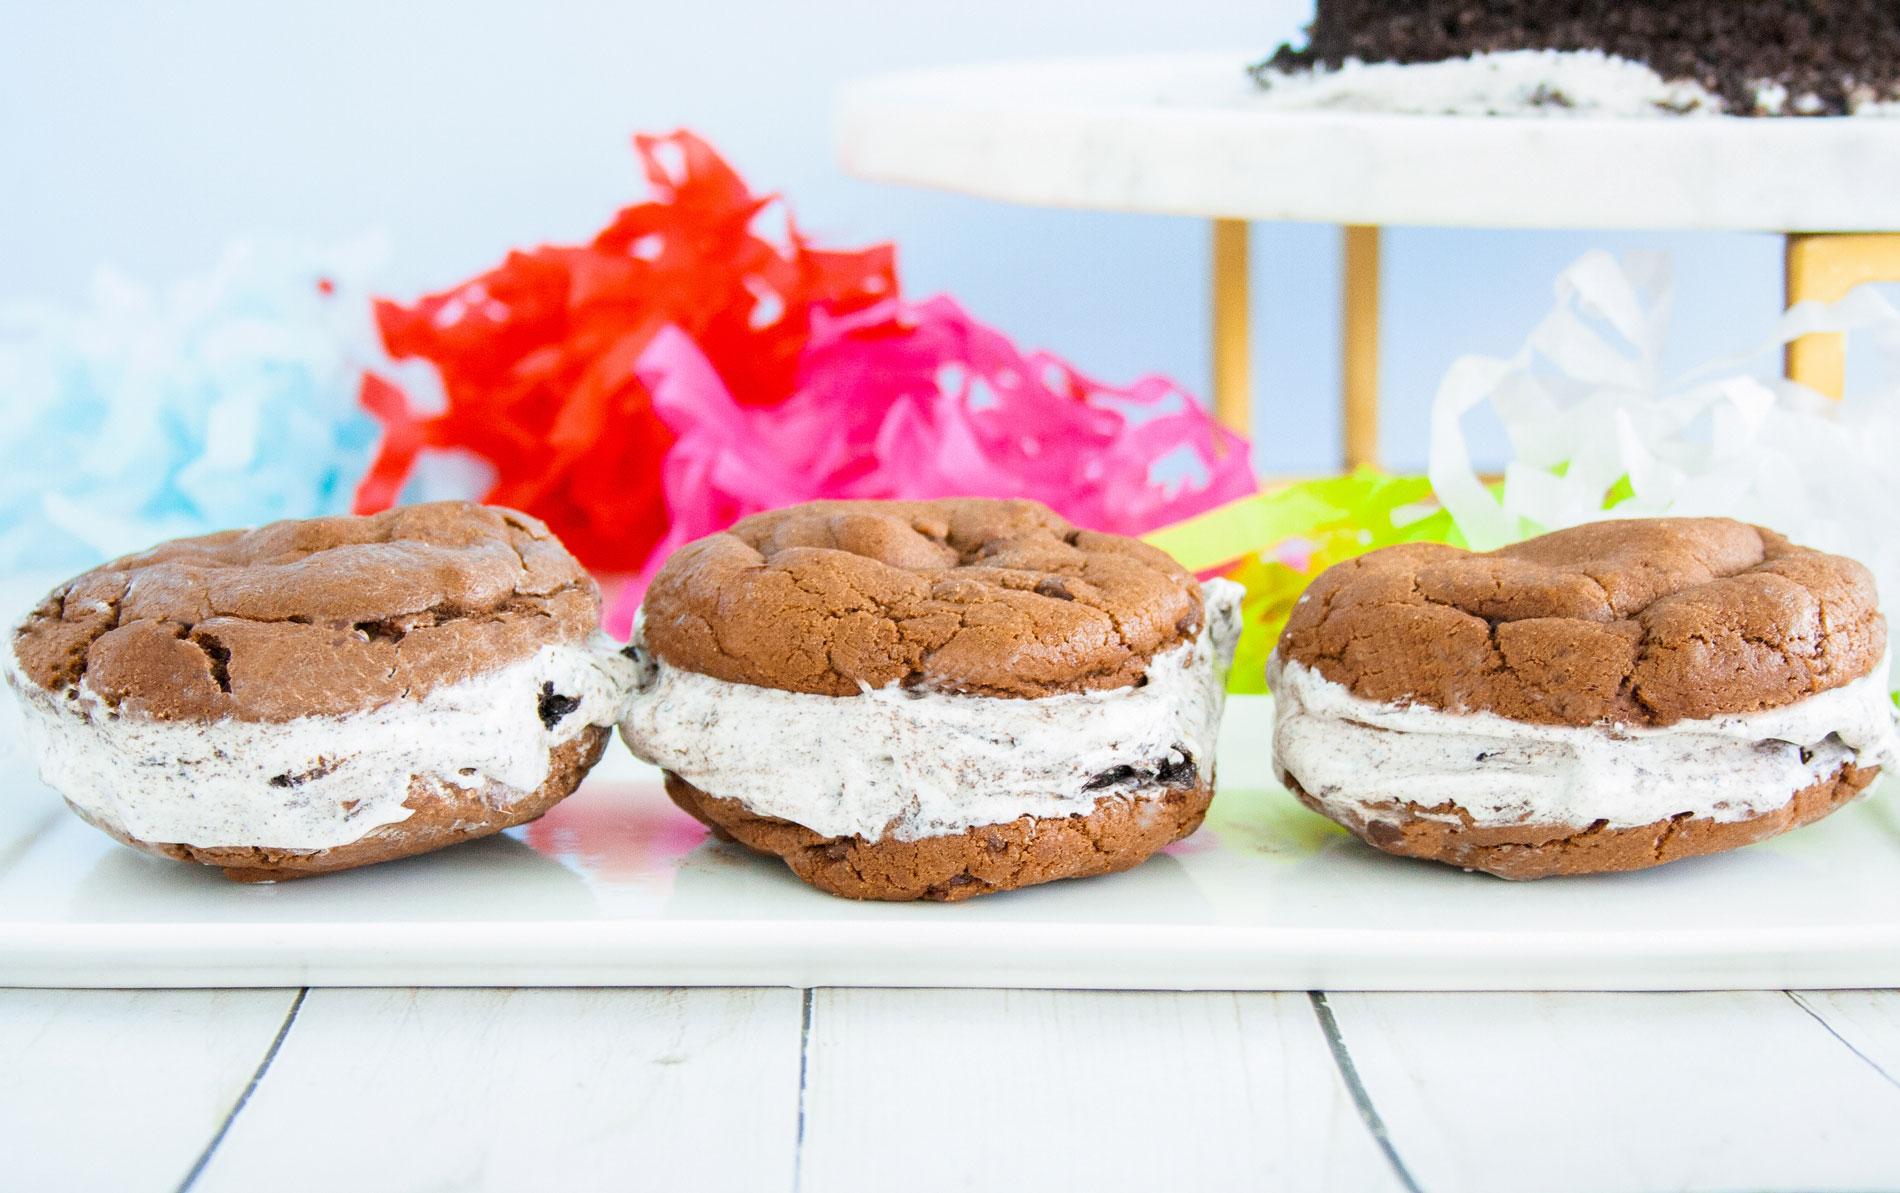 Mocha Carvel Oreo Ice Cream Sandwich